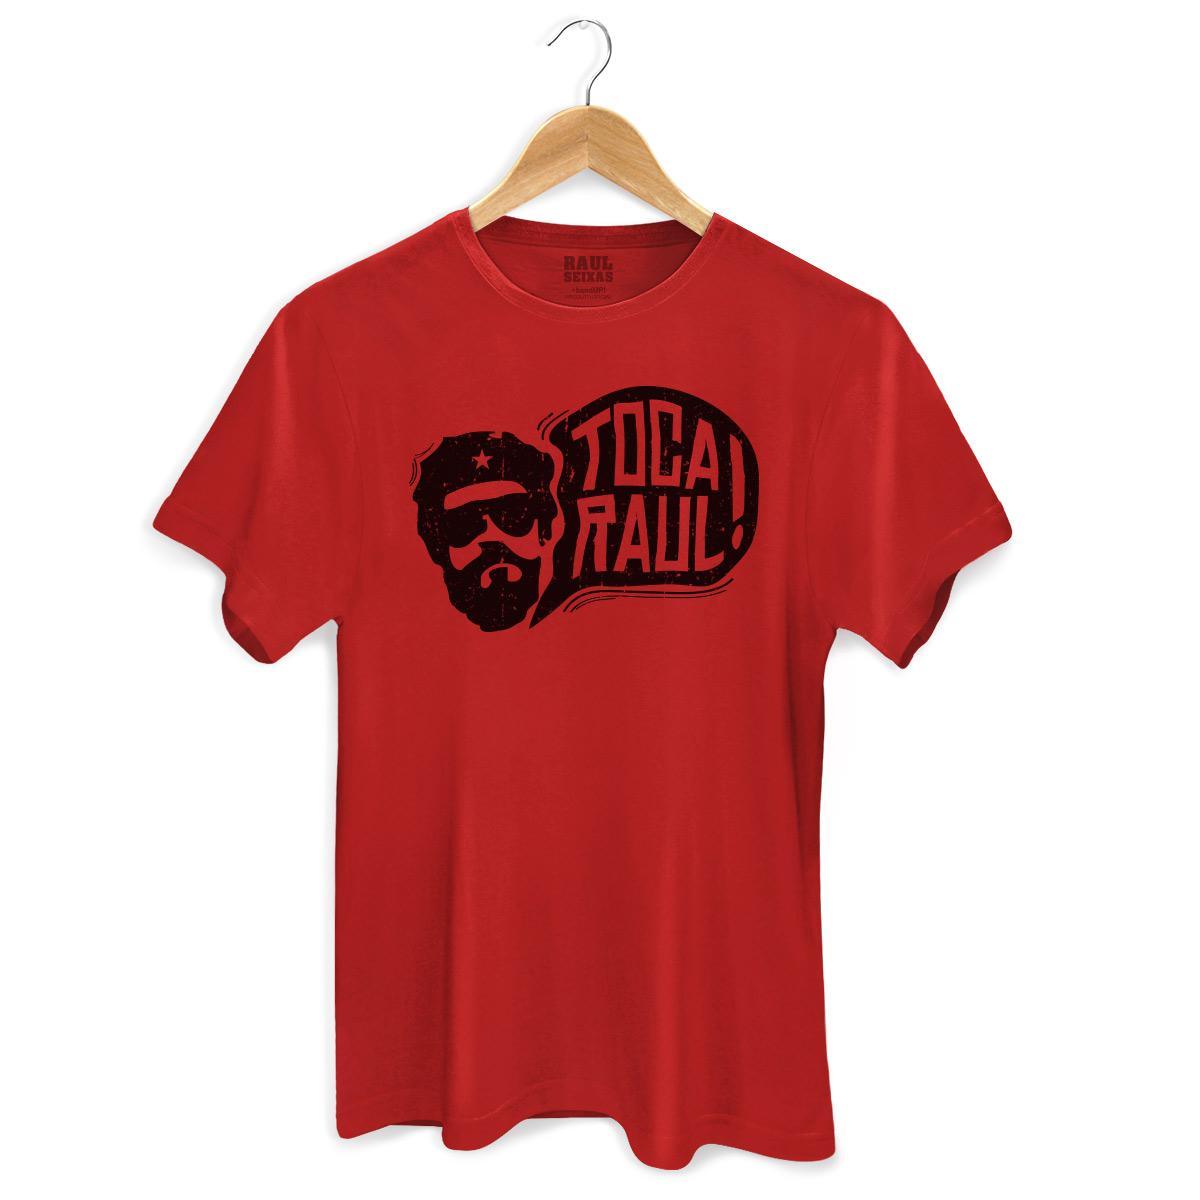 Camiseta Masculina Raul Seixas Toca Raul! 2